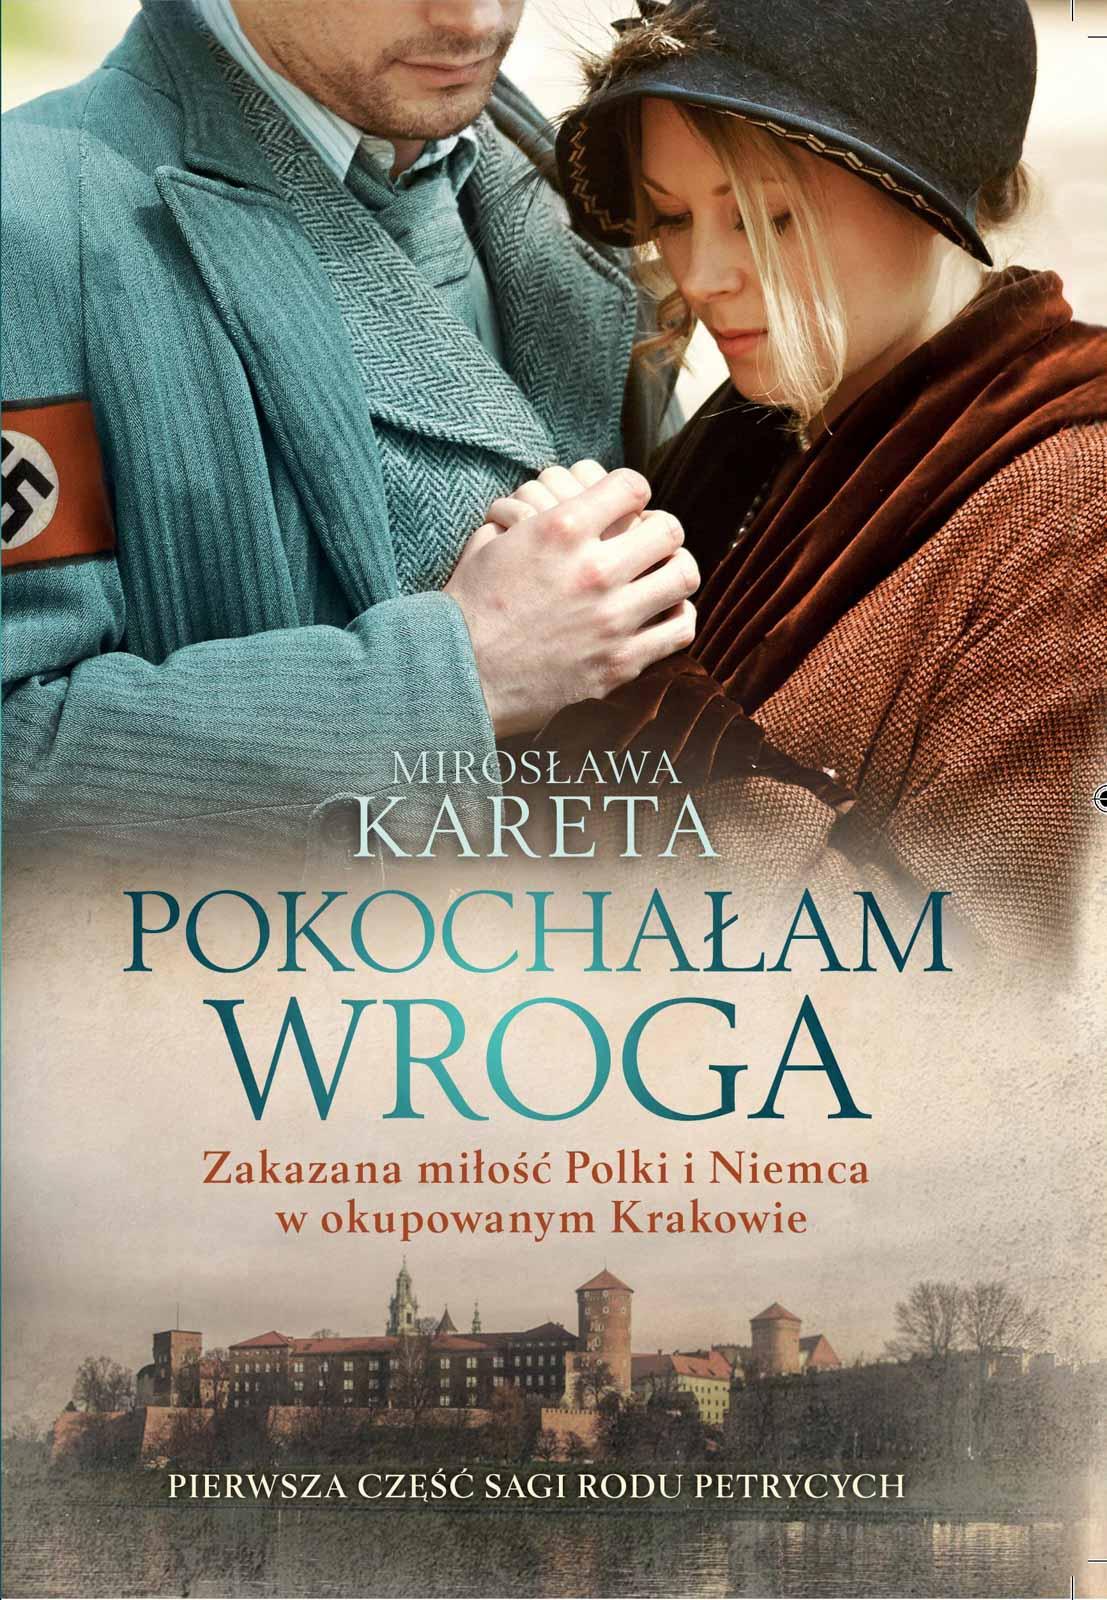 """Pokochałam wroga"" Mirosława Kareta"